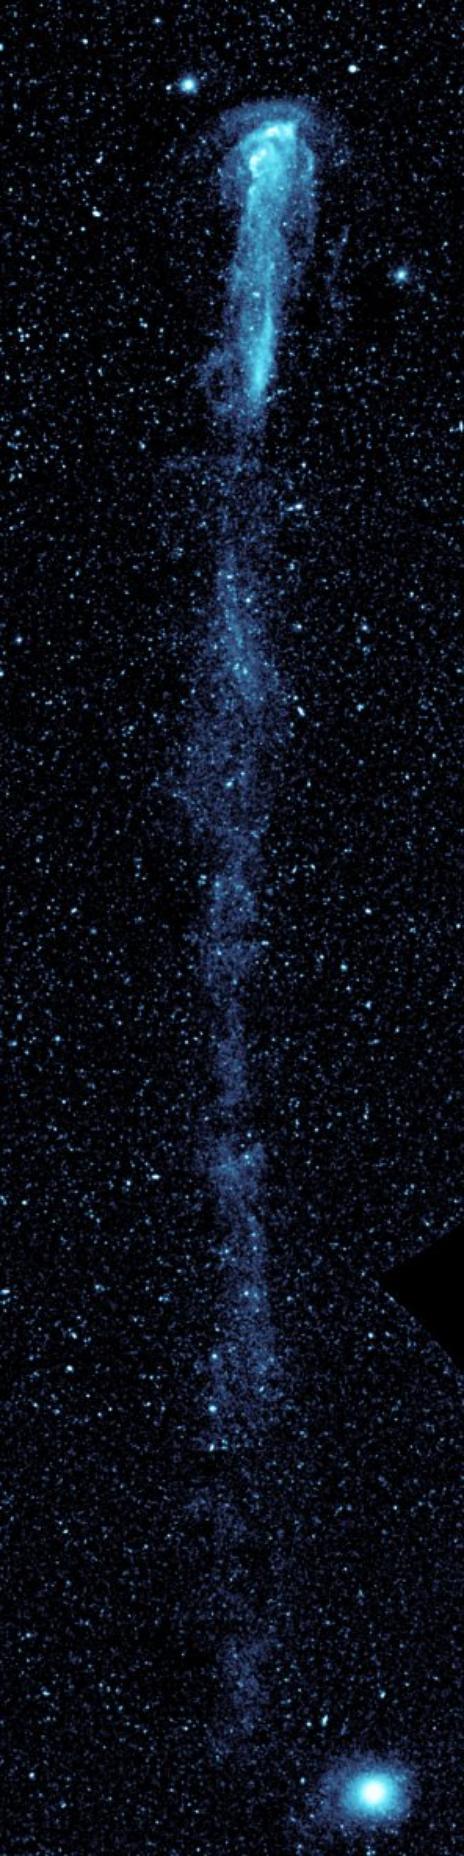 Mira = ο Cet = ο Ceti = Omicron Ceti